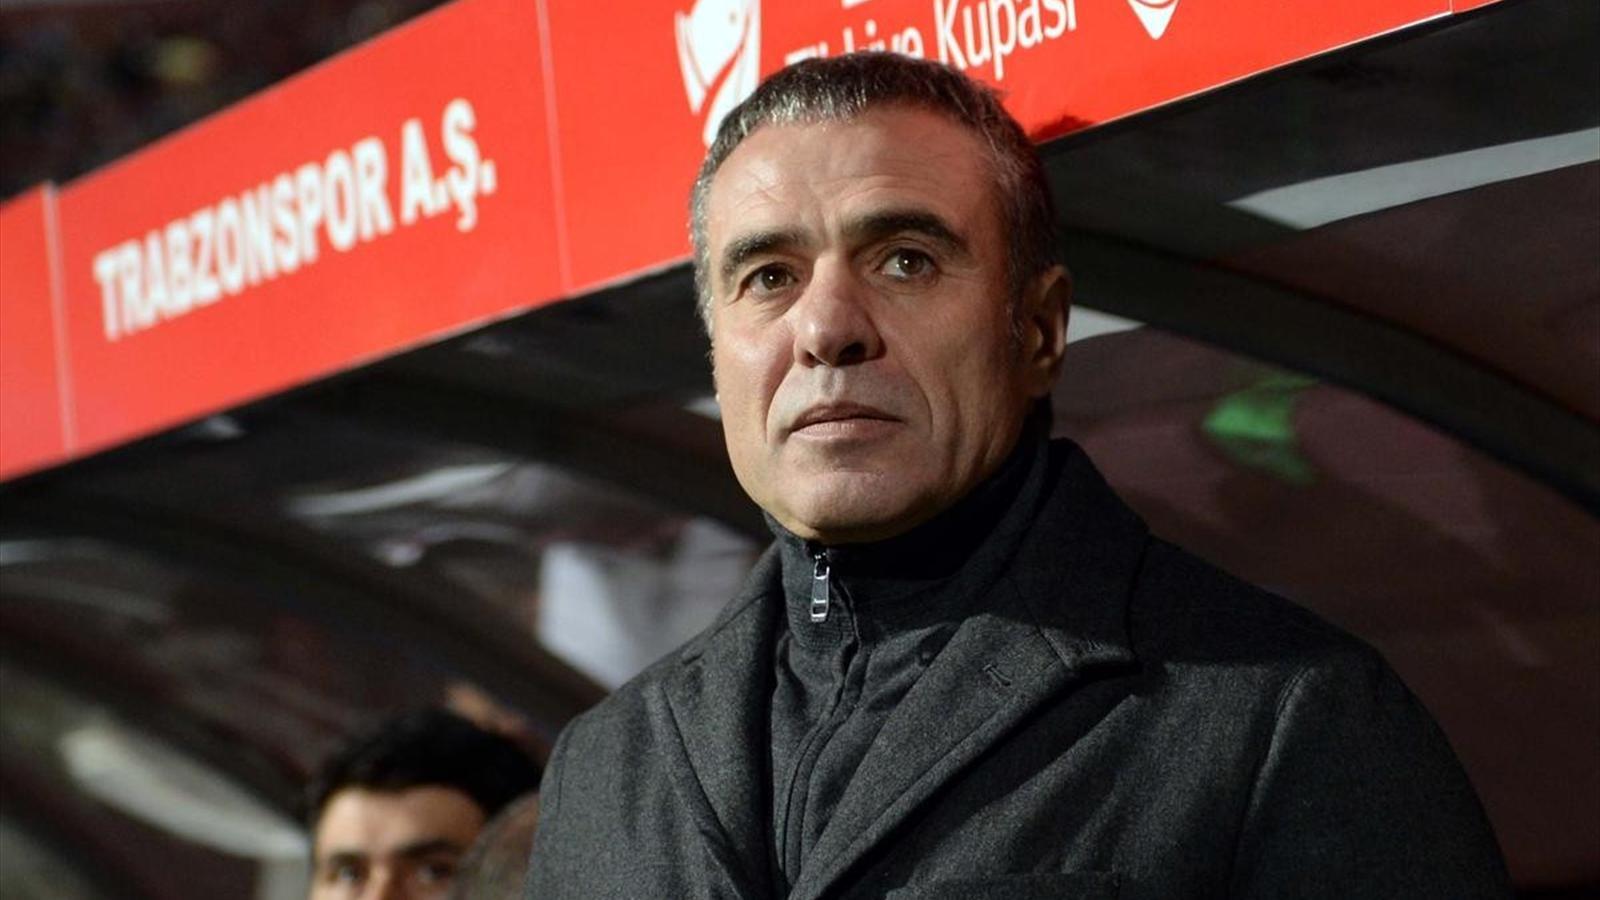 Trabzonspor'da gözler Napoli maçına çevrildi